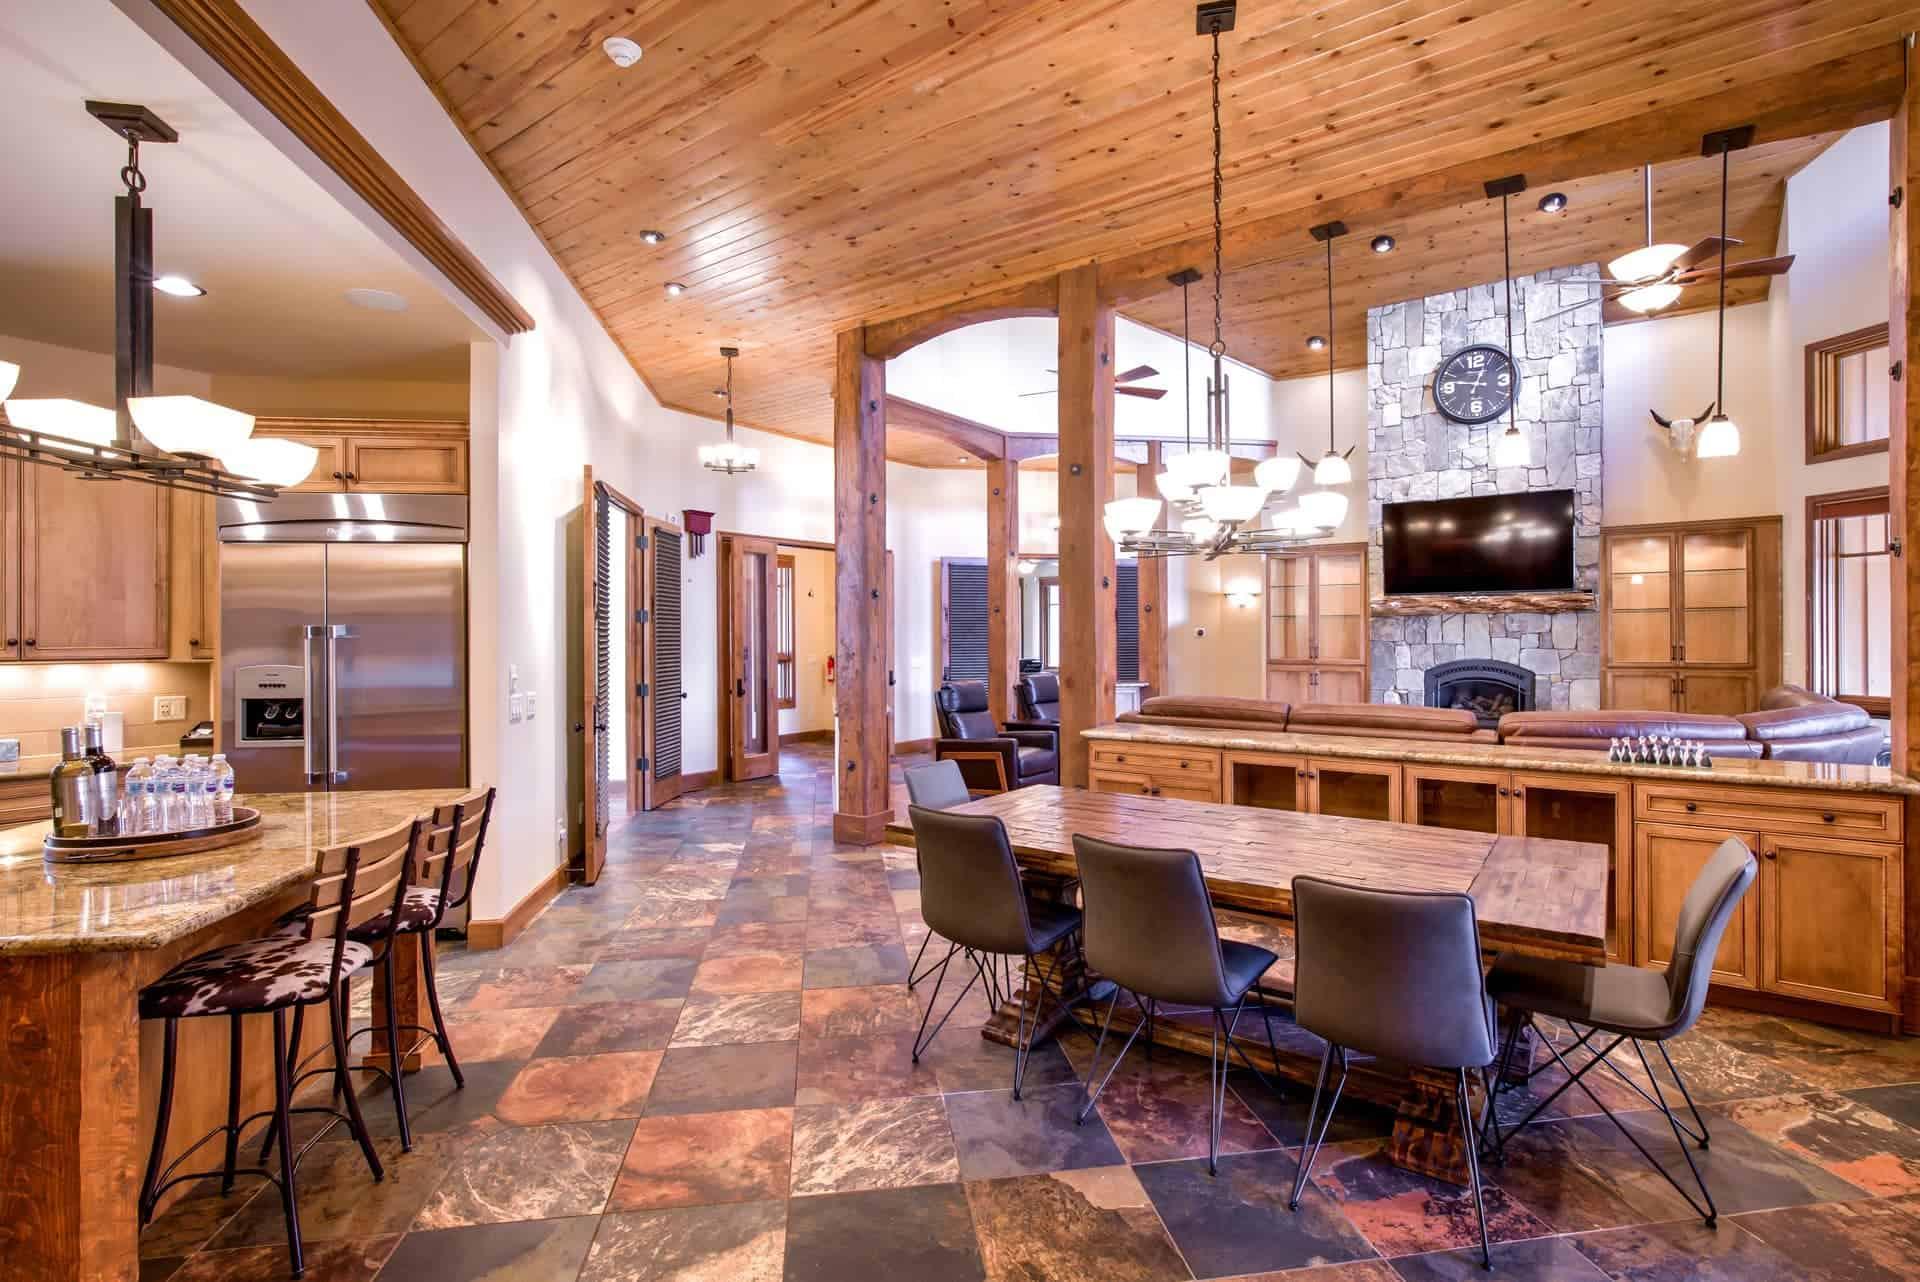 Image of luxury cabin in Flagstaff, Arizona